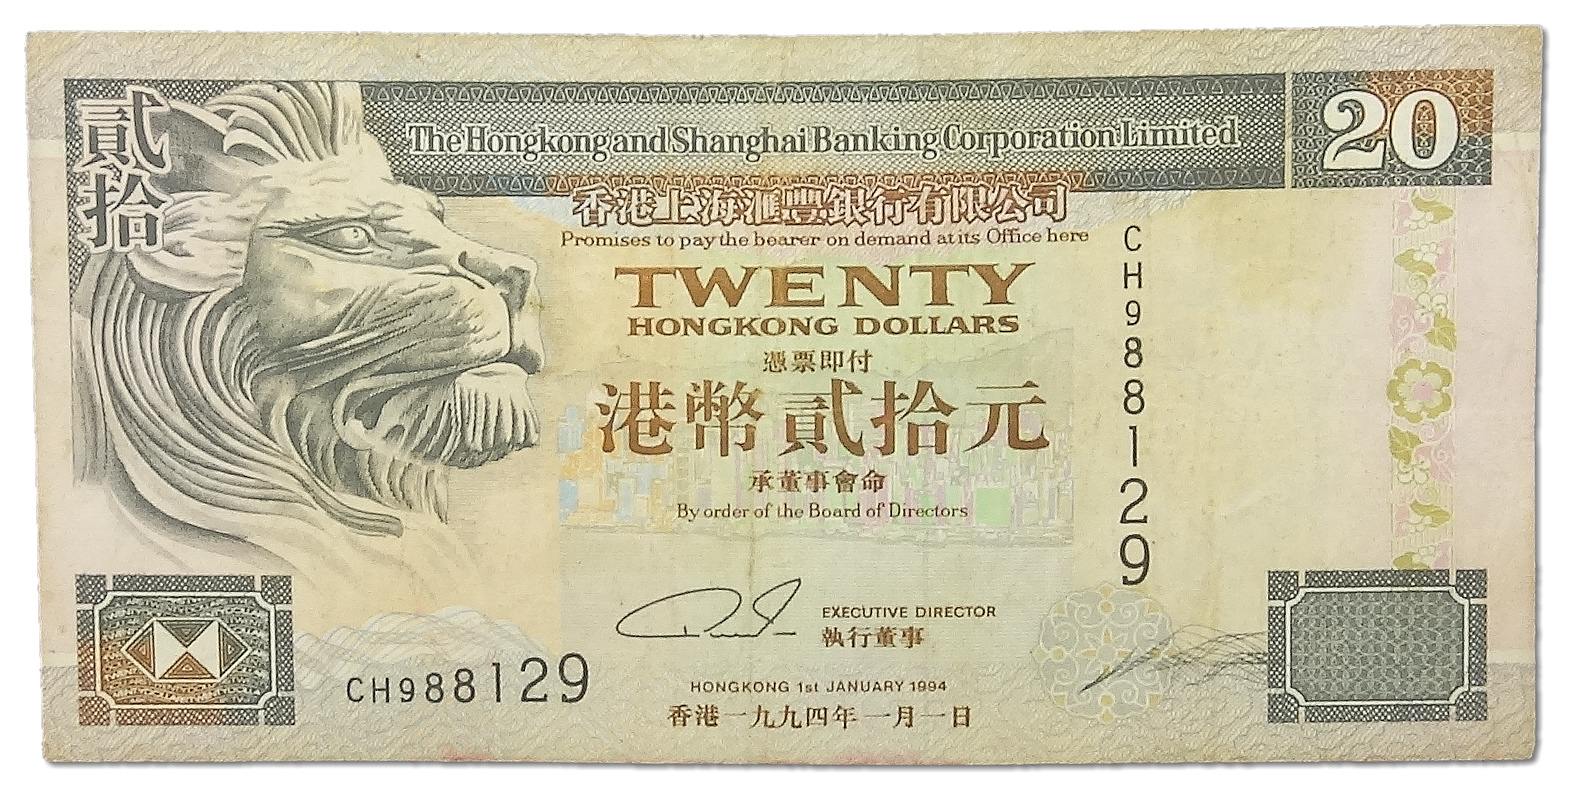 34.Hong Kong, 20 Dolarów 1994, P.201.a, St.3+